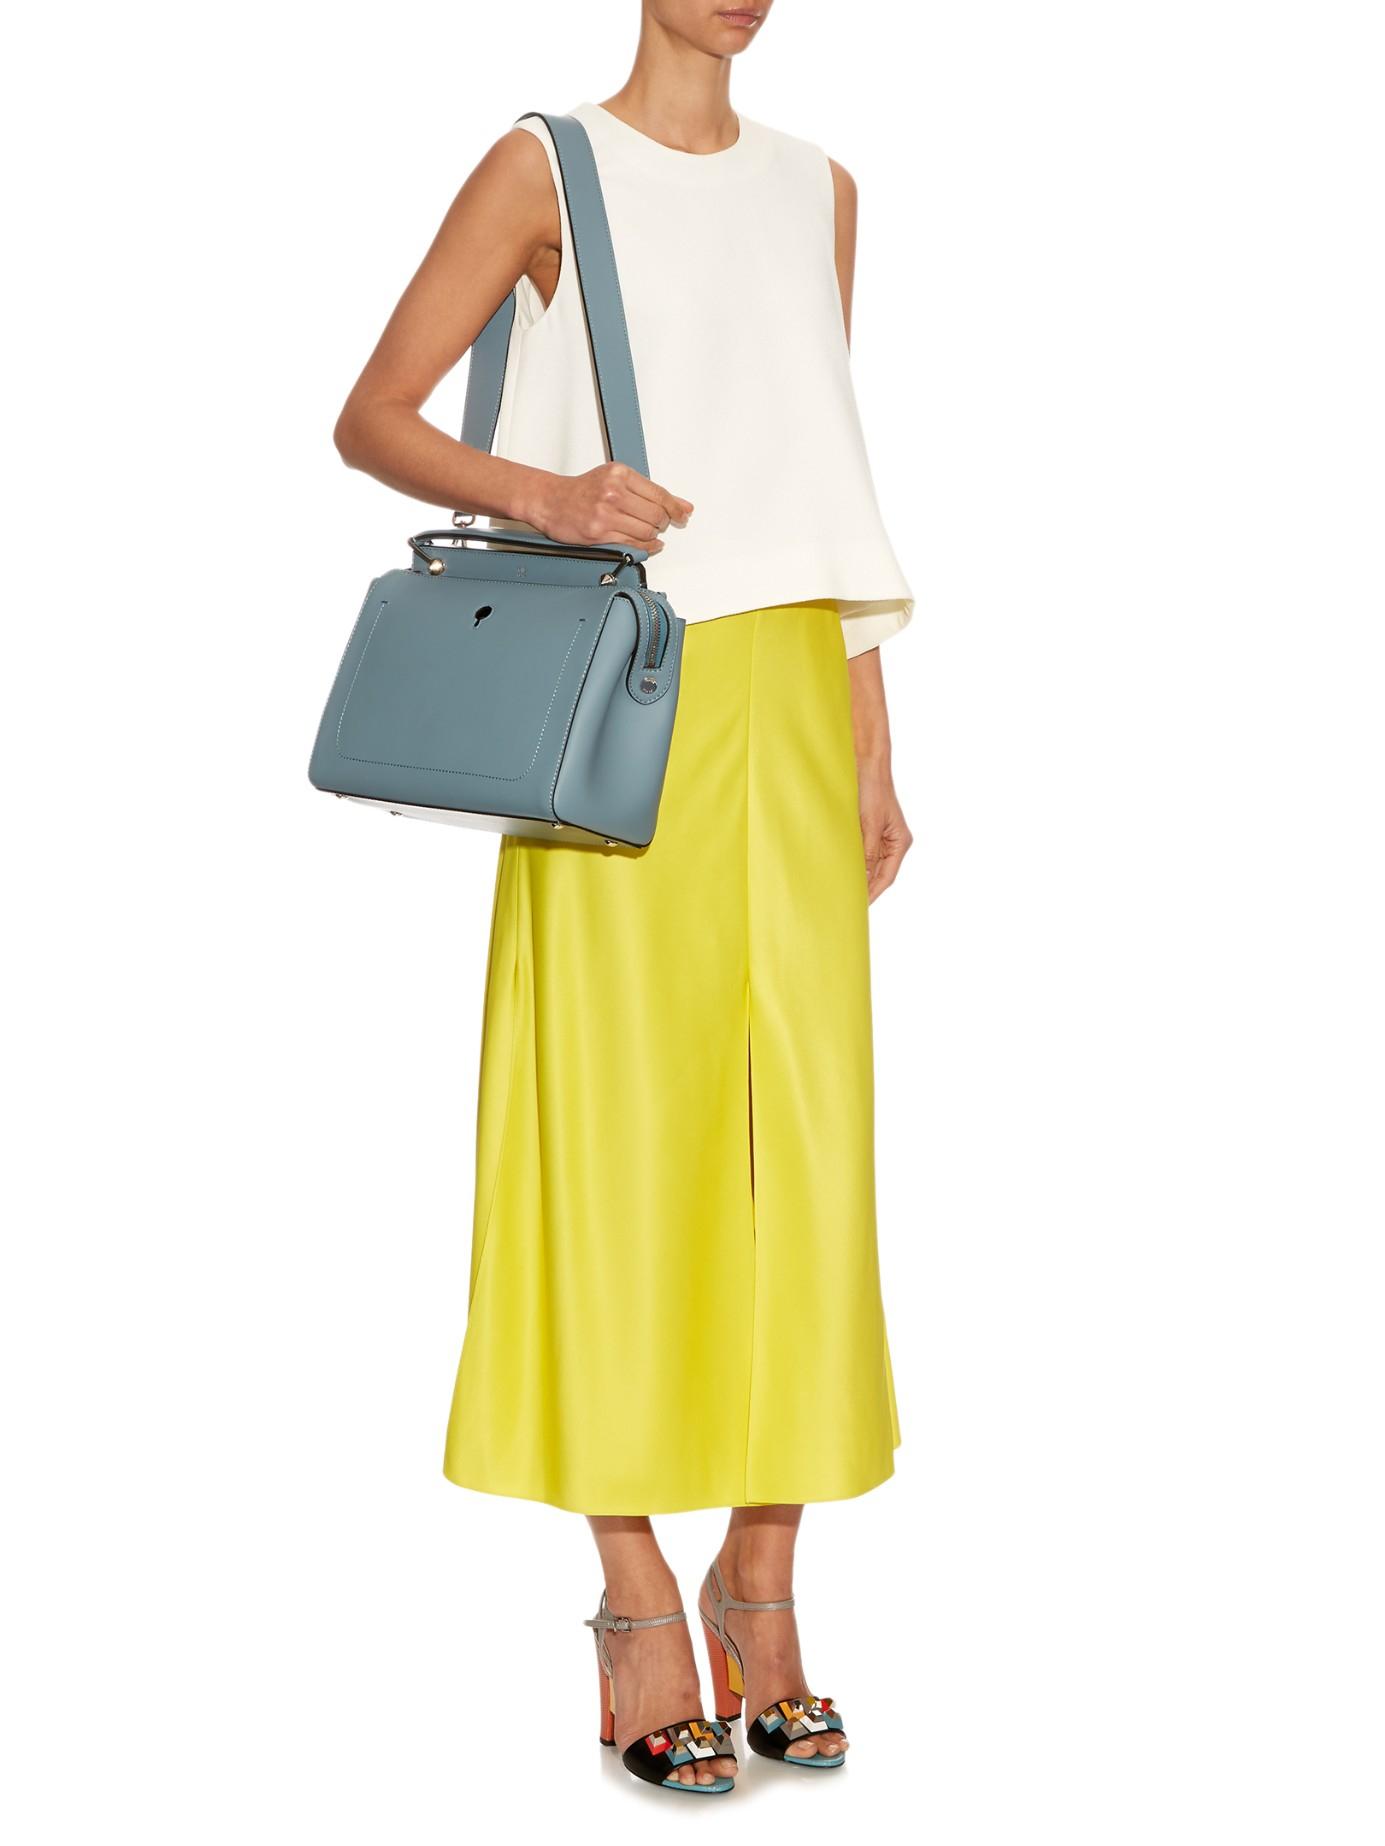 d8d4d17e308f Lyst - Fendi Dotcom Leather Bag in Blue